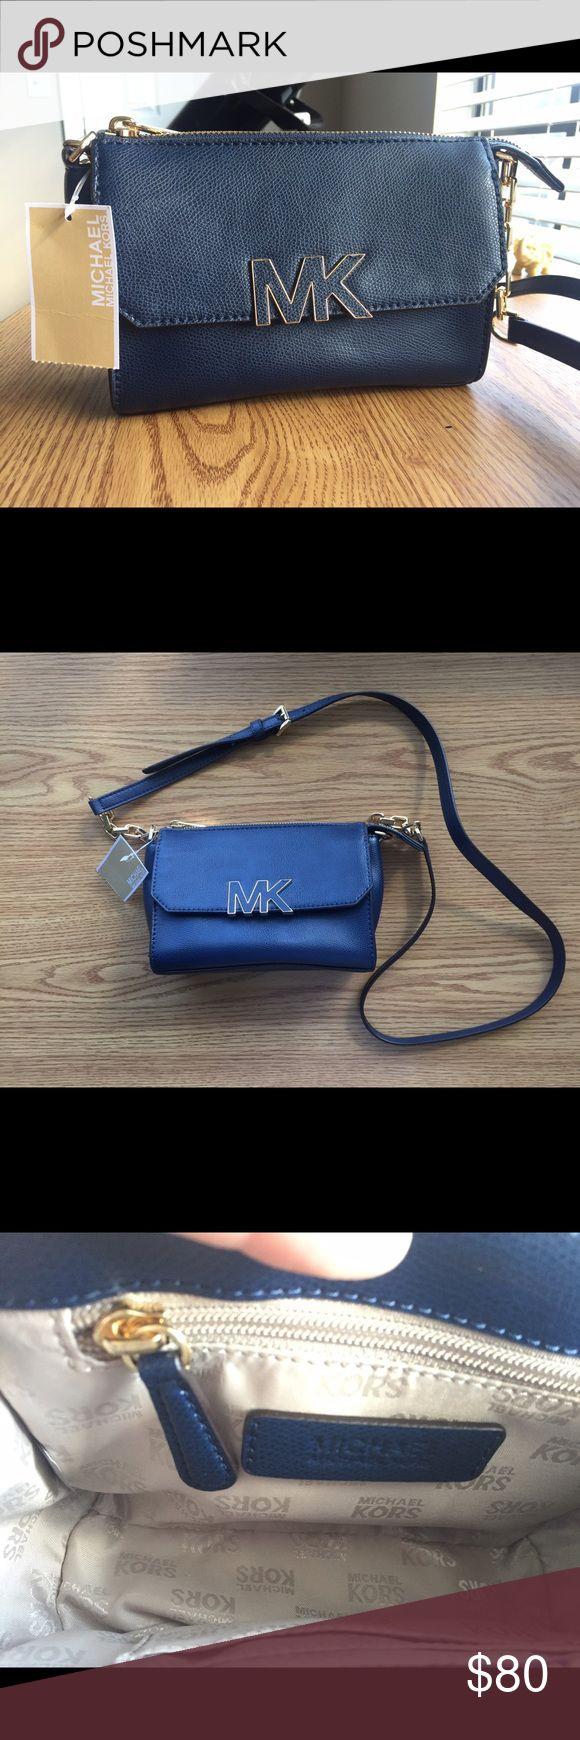 Michael Kors Navy Pebbled Leather Shoulder Purse Cute navy blue, pebbled leather shoulder bag from Michael Kors. Brand new, never used. Michael Kors Bags Crossbody Bags